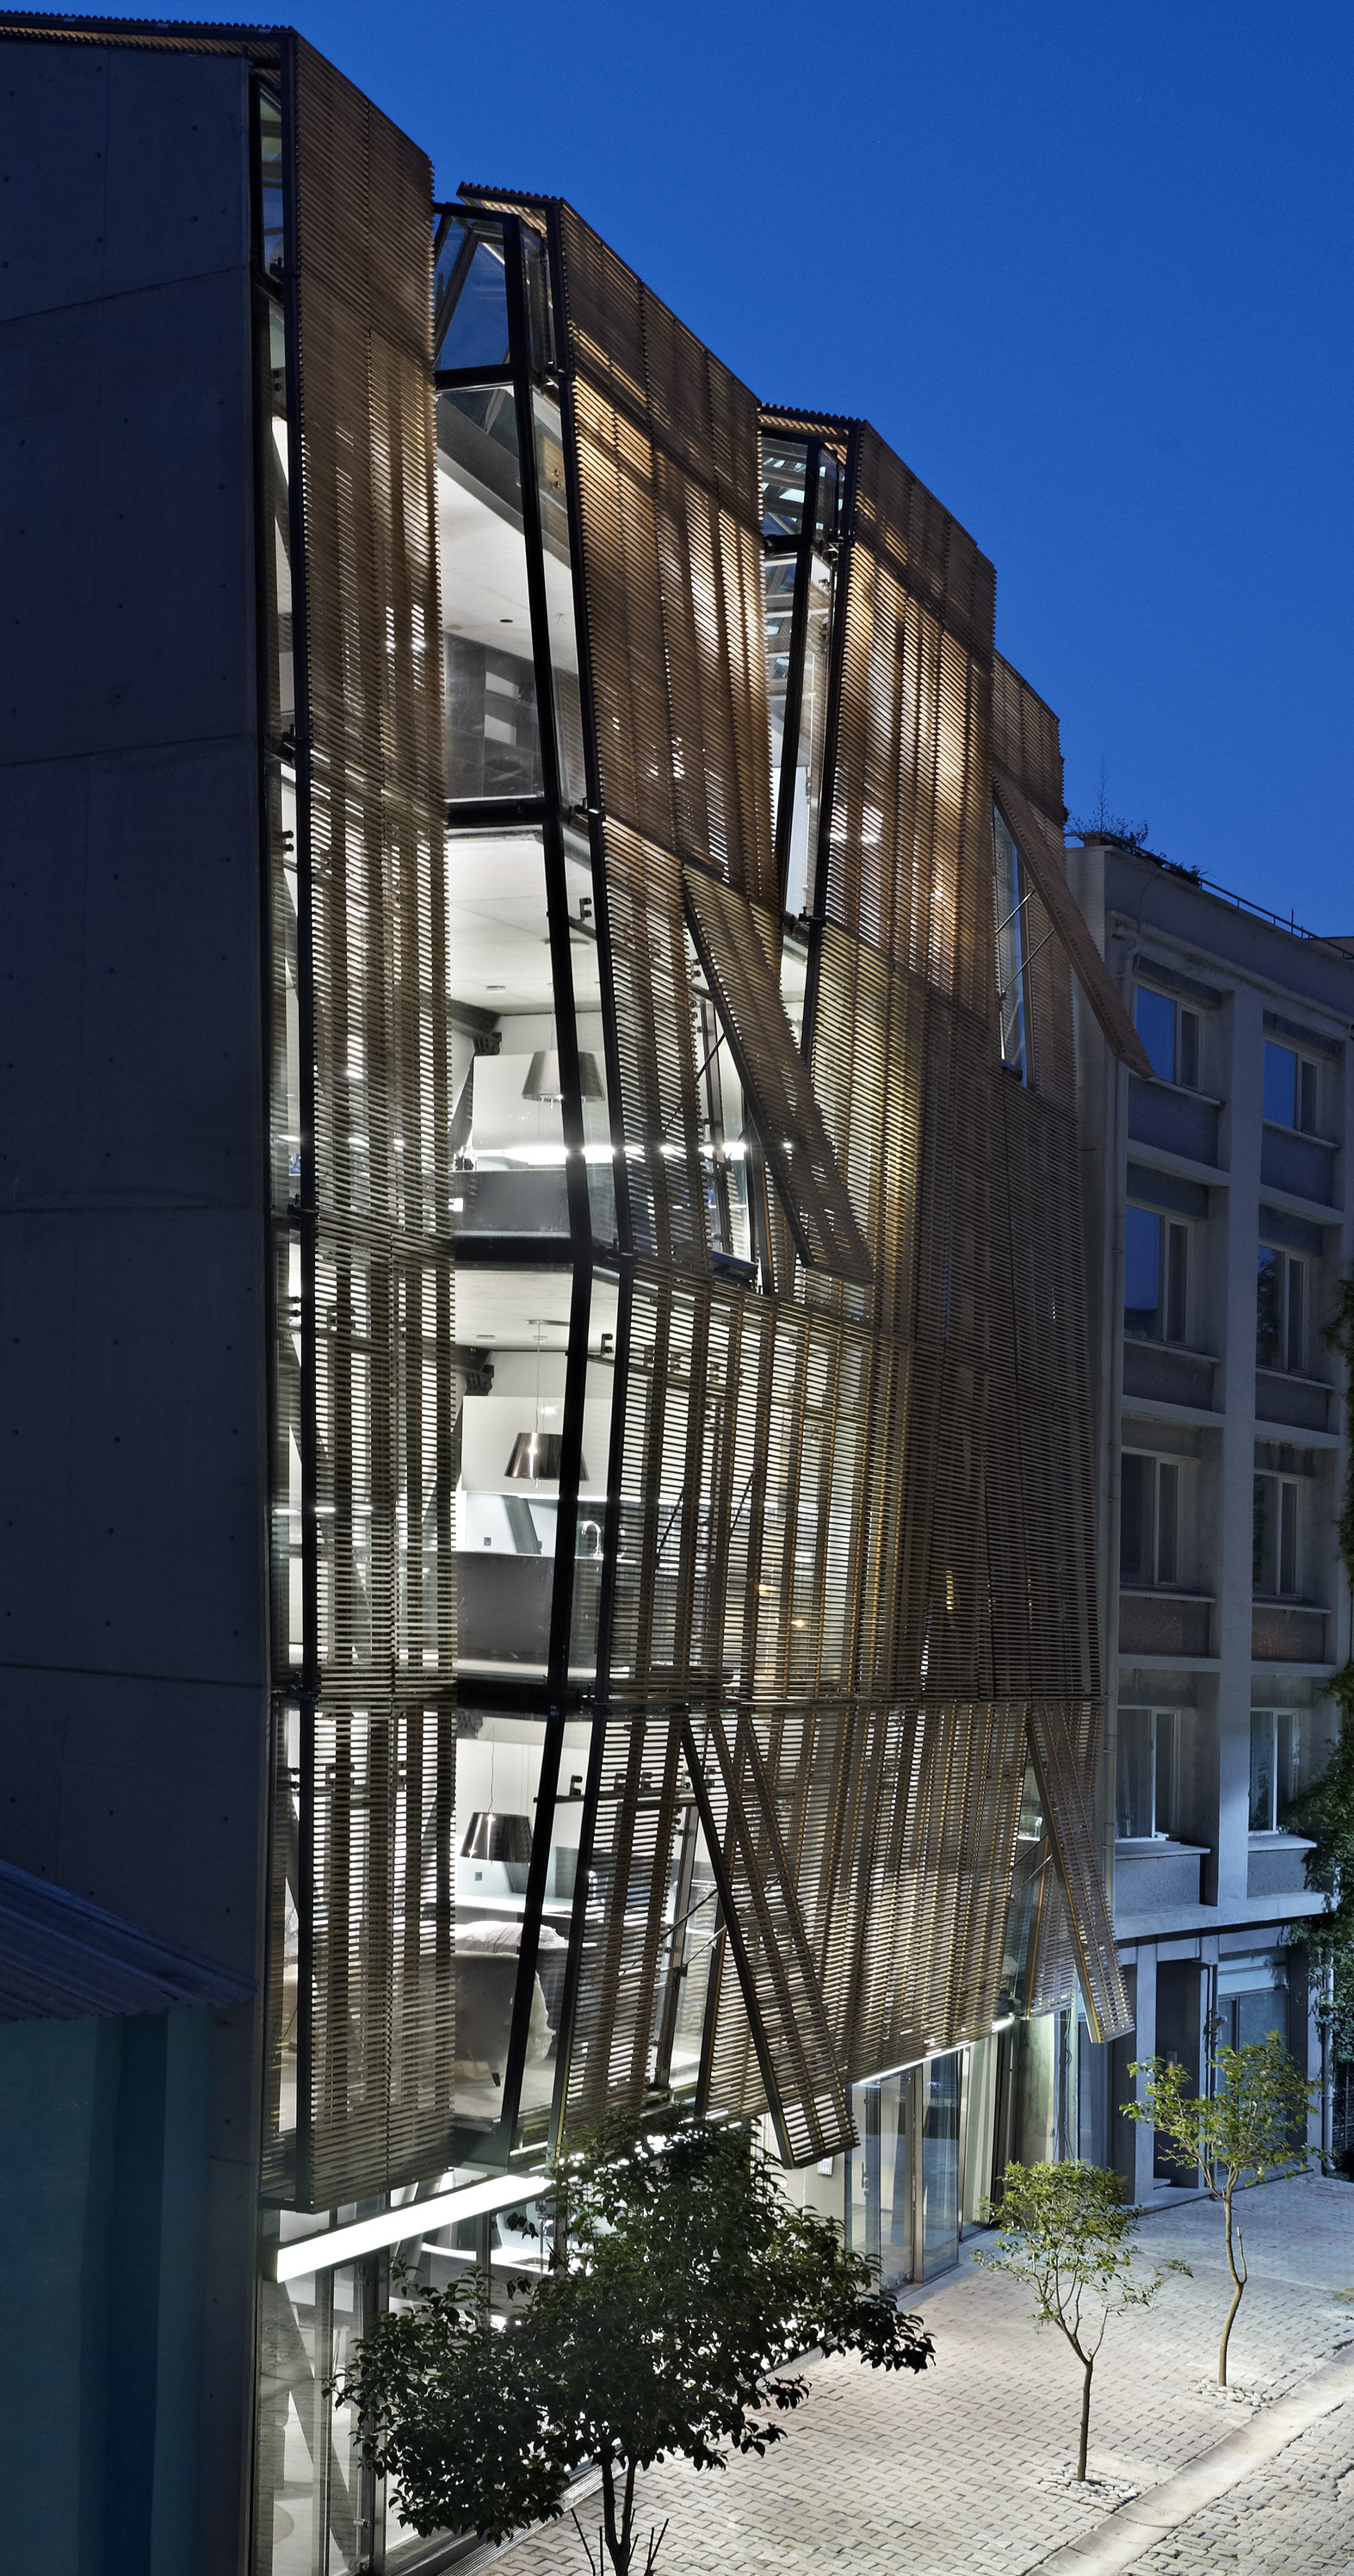 galer a de pera 25 alata architecture consulting 2. Black Bedroom Furniture Sets. Home Design Ideas